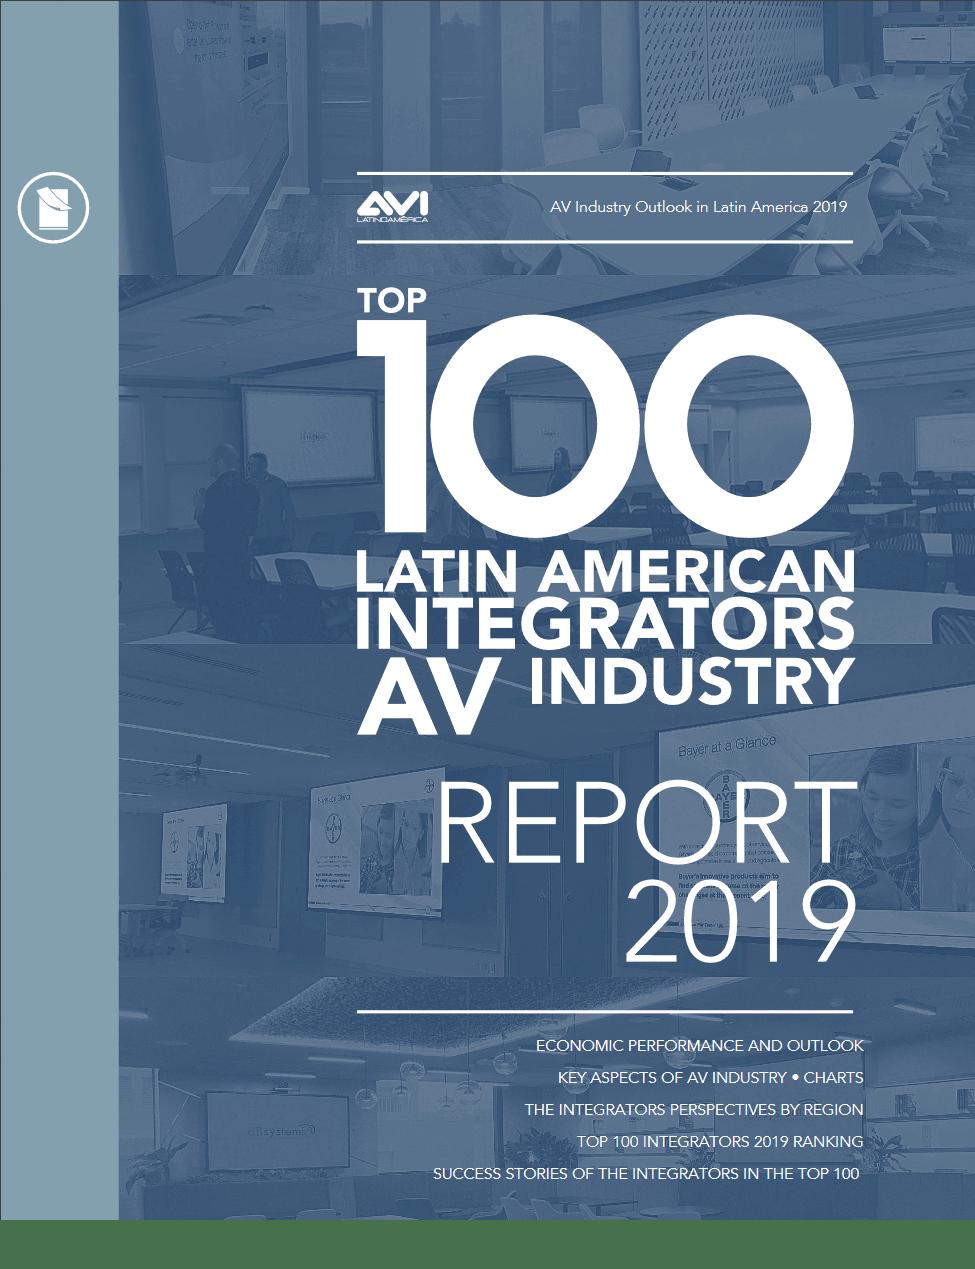 TOP 100 LATIN AMERICAN A/V SYSTEMS INTEGRATORS • 2019-2020 Image